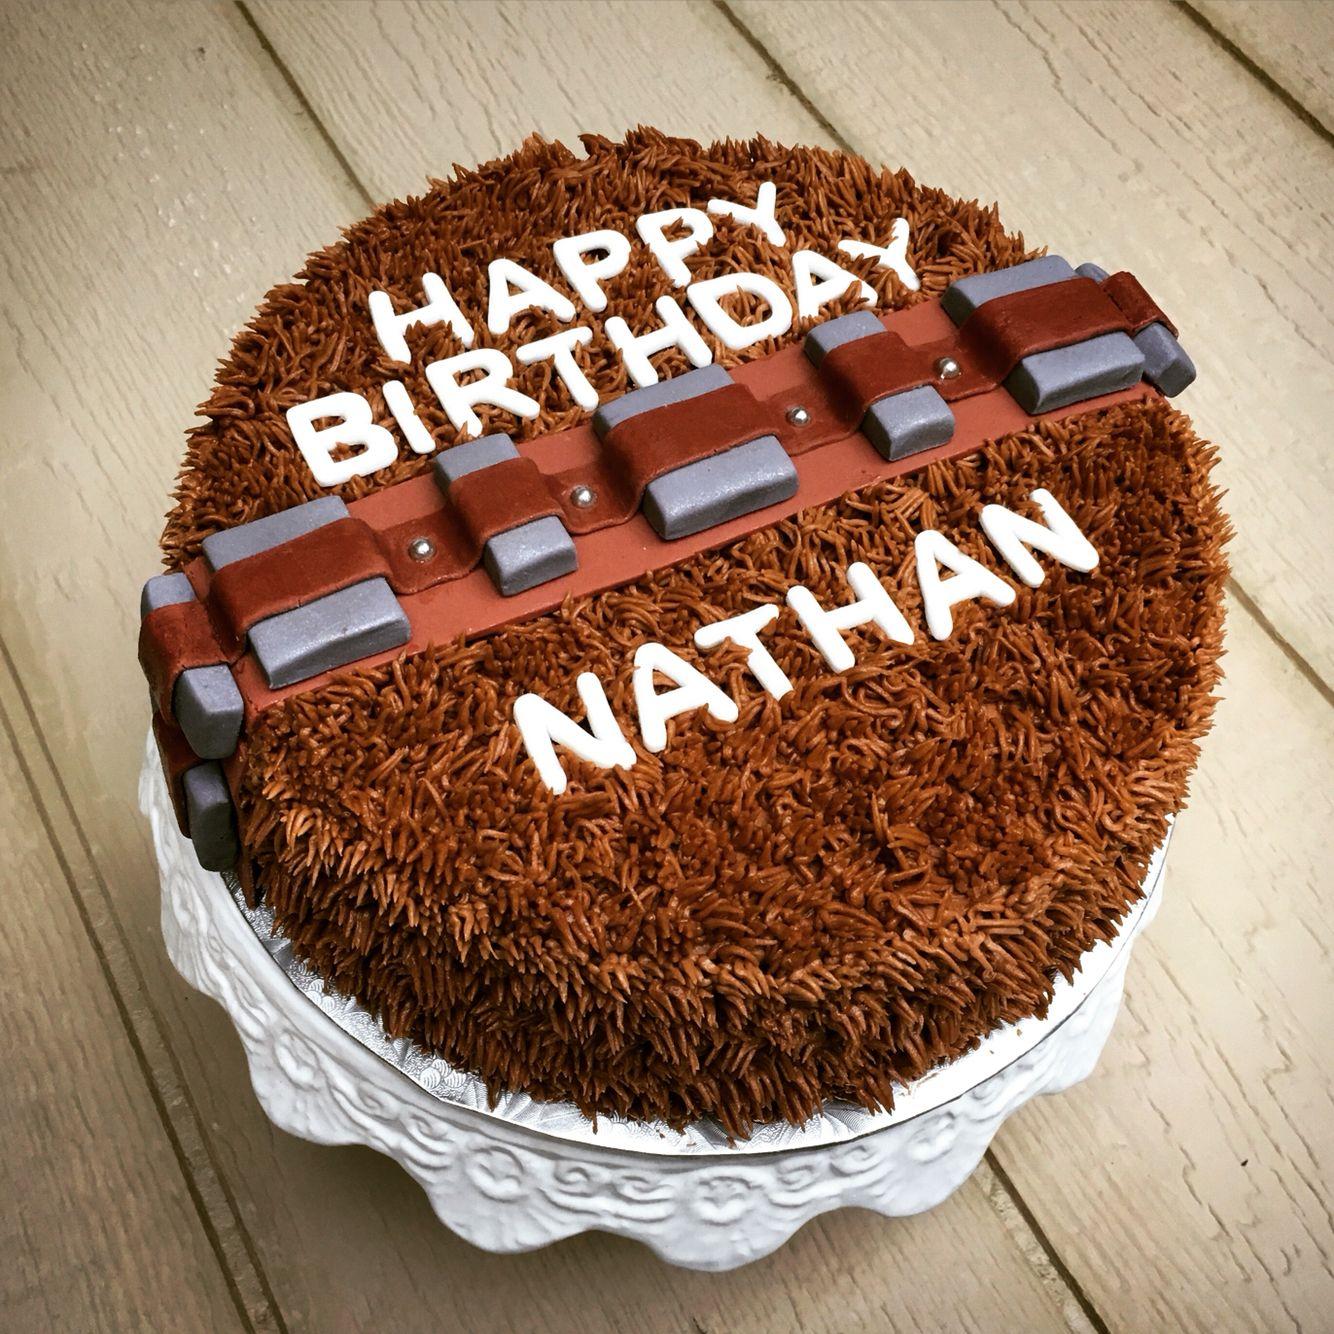 Chocolate Chewbacca Www Dunmorecandykitchen Com: Chewbacca Star Wars Cake